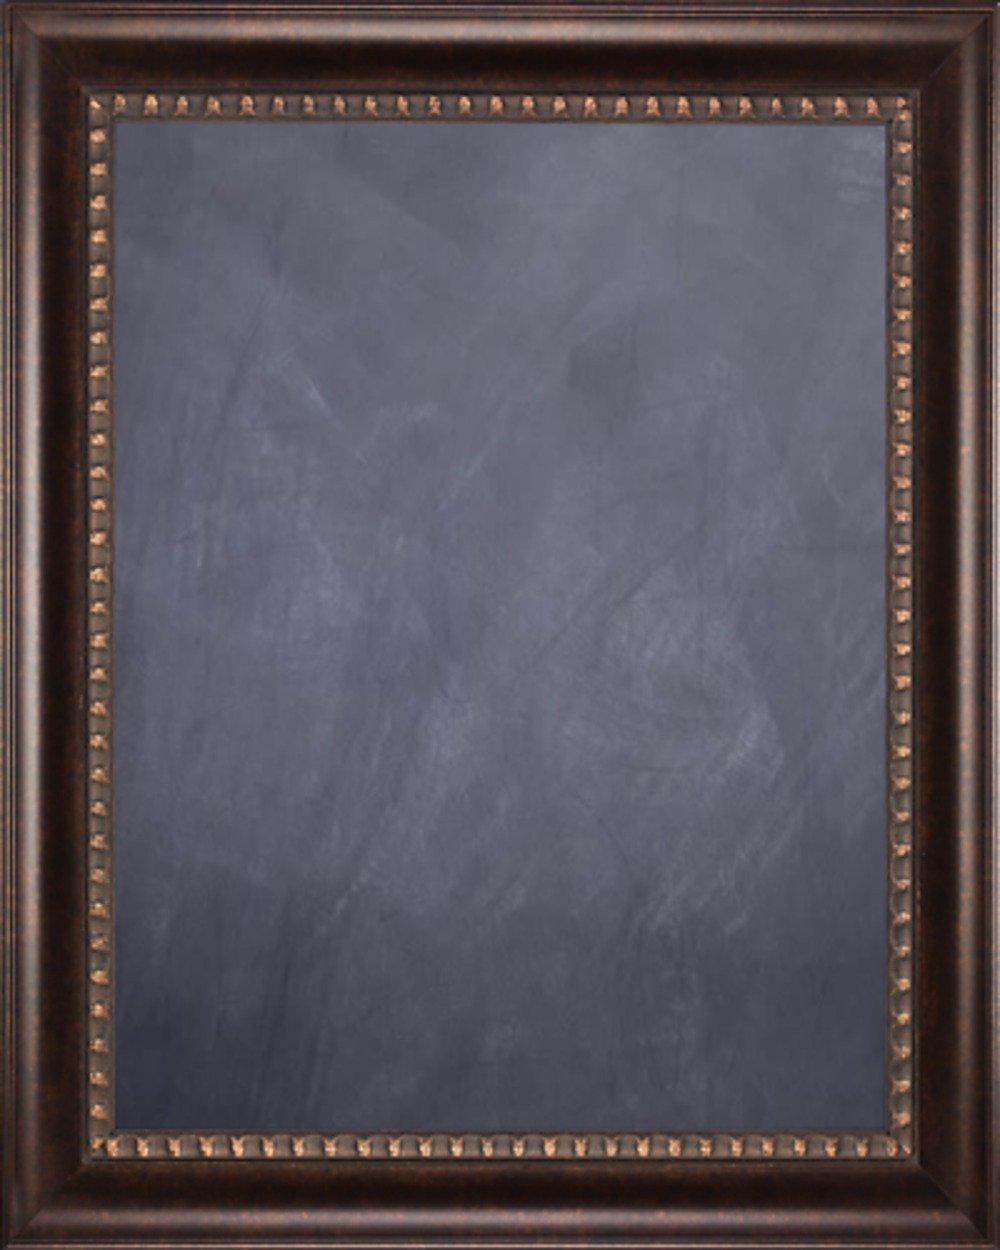 Framed Chalkboard 24'' x 36'' - with Dark Bronze Finish Scoop Frame by Art Oyster